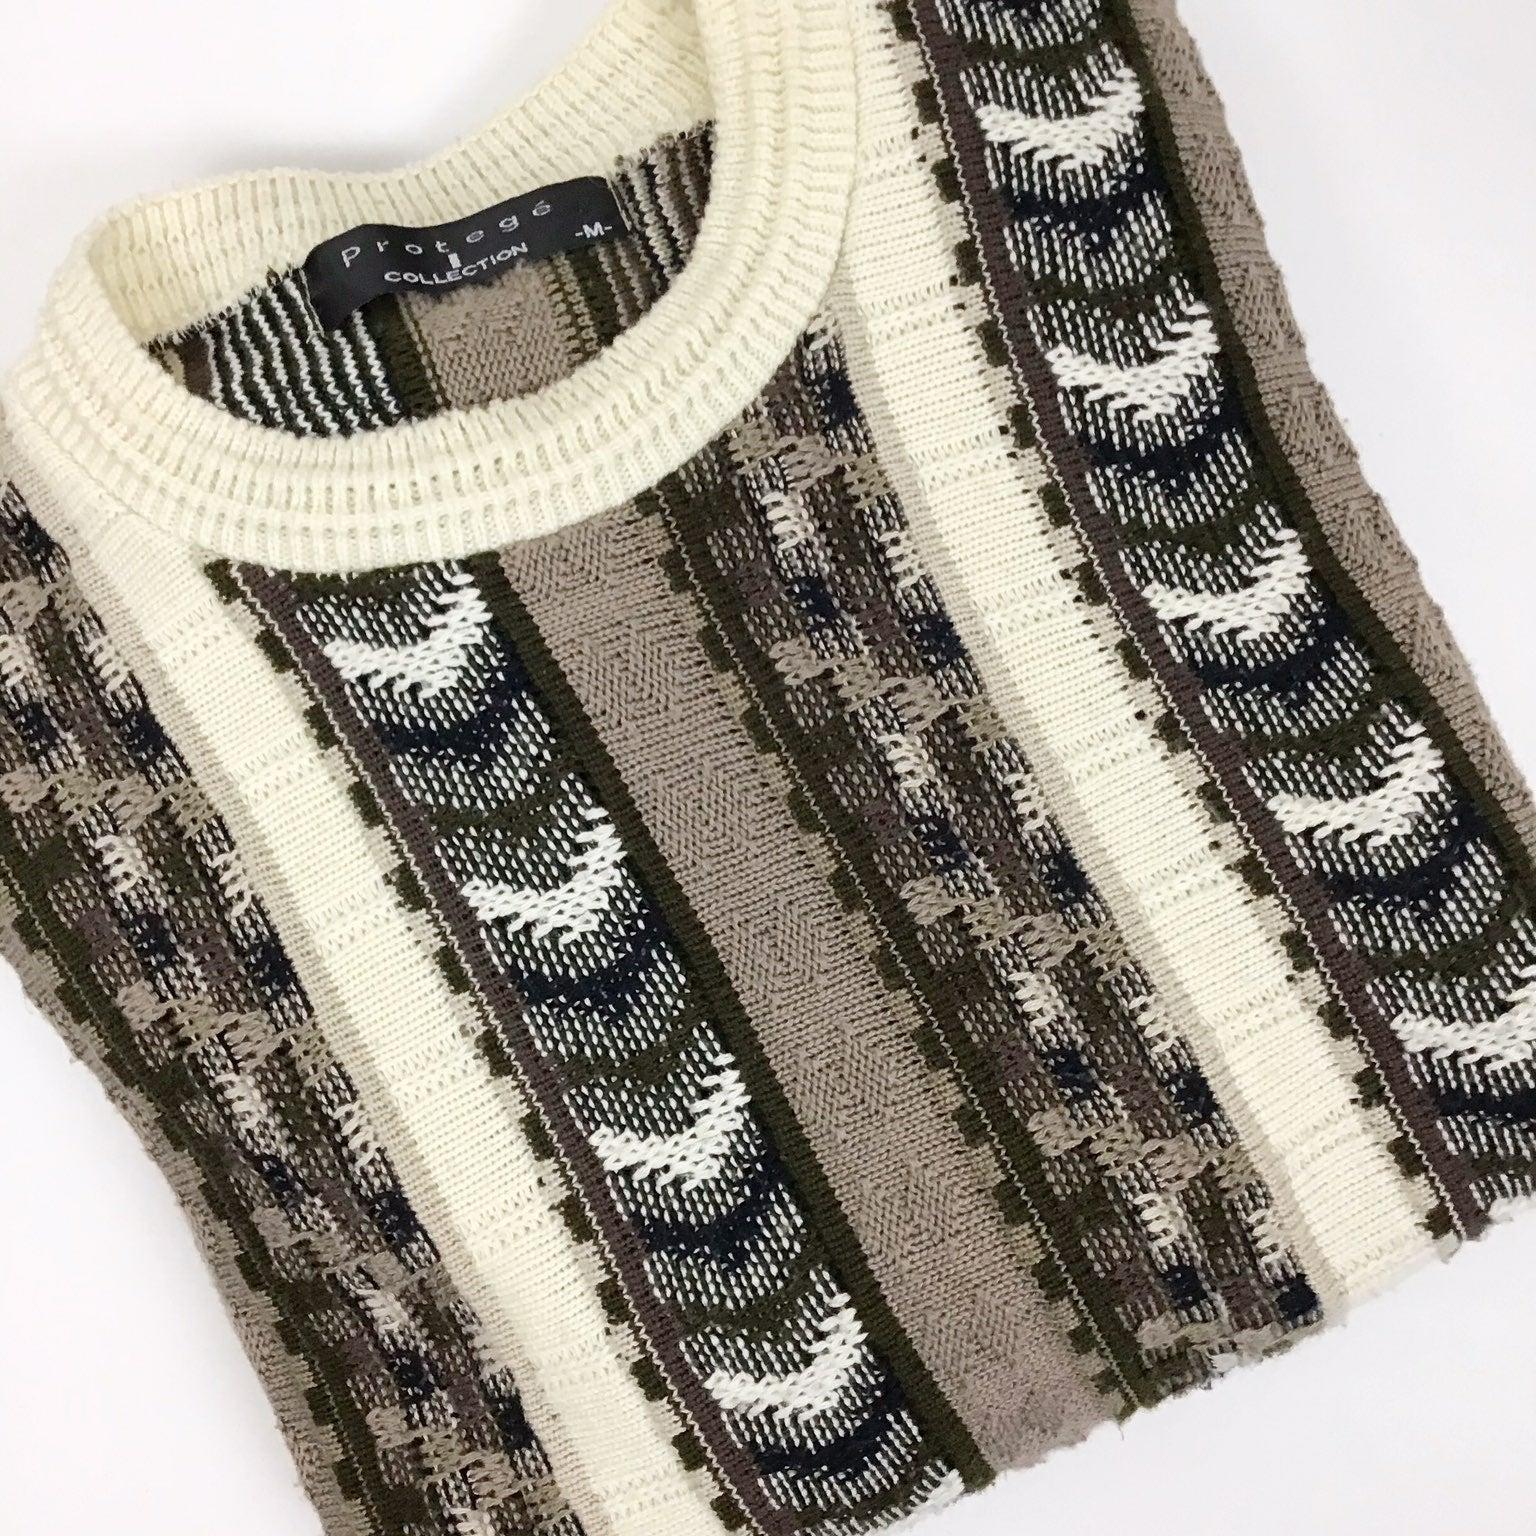 protege green & brown grandpa sweater m